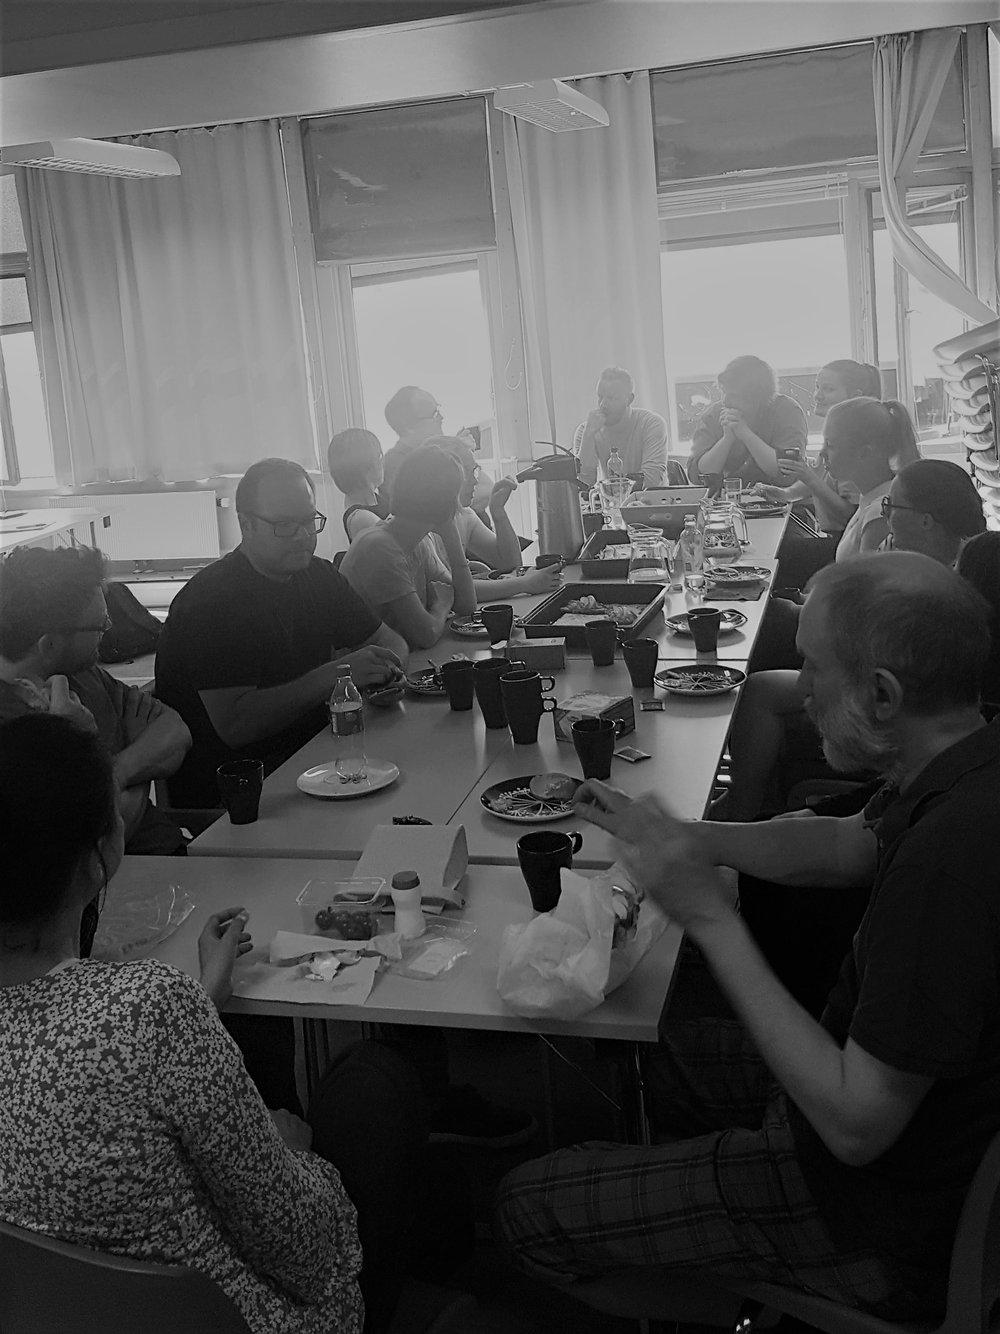 2018-05-15 Fagdager i BD, seminar med NU og FolkOrg mfl.jpg